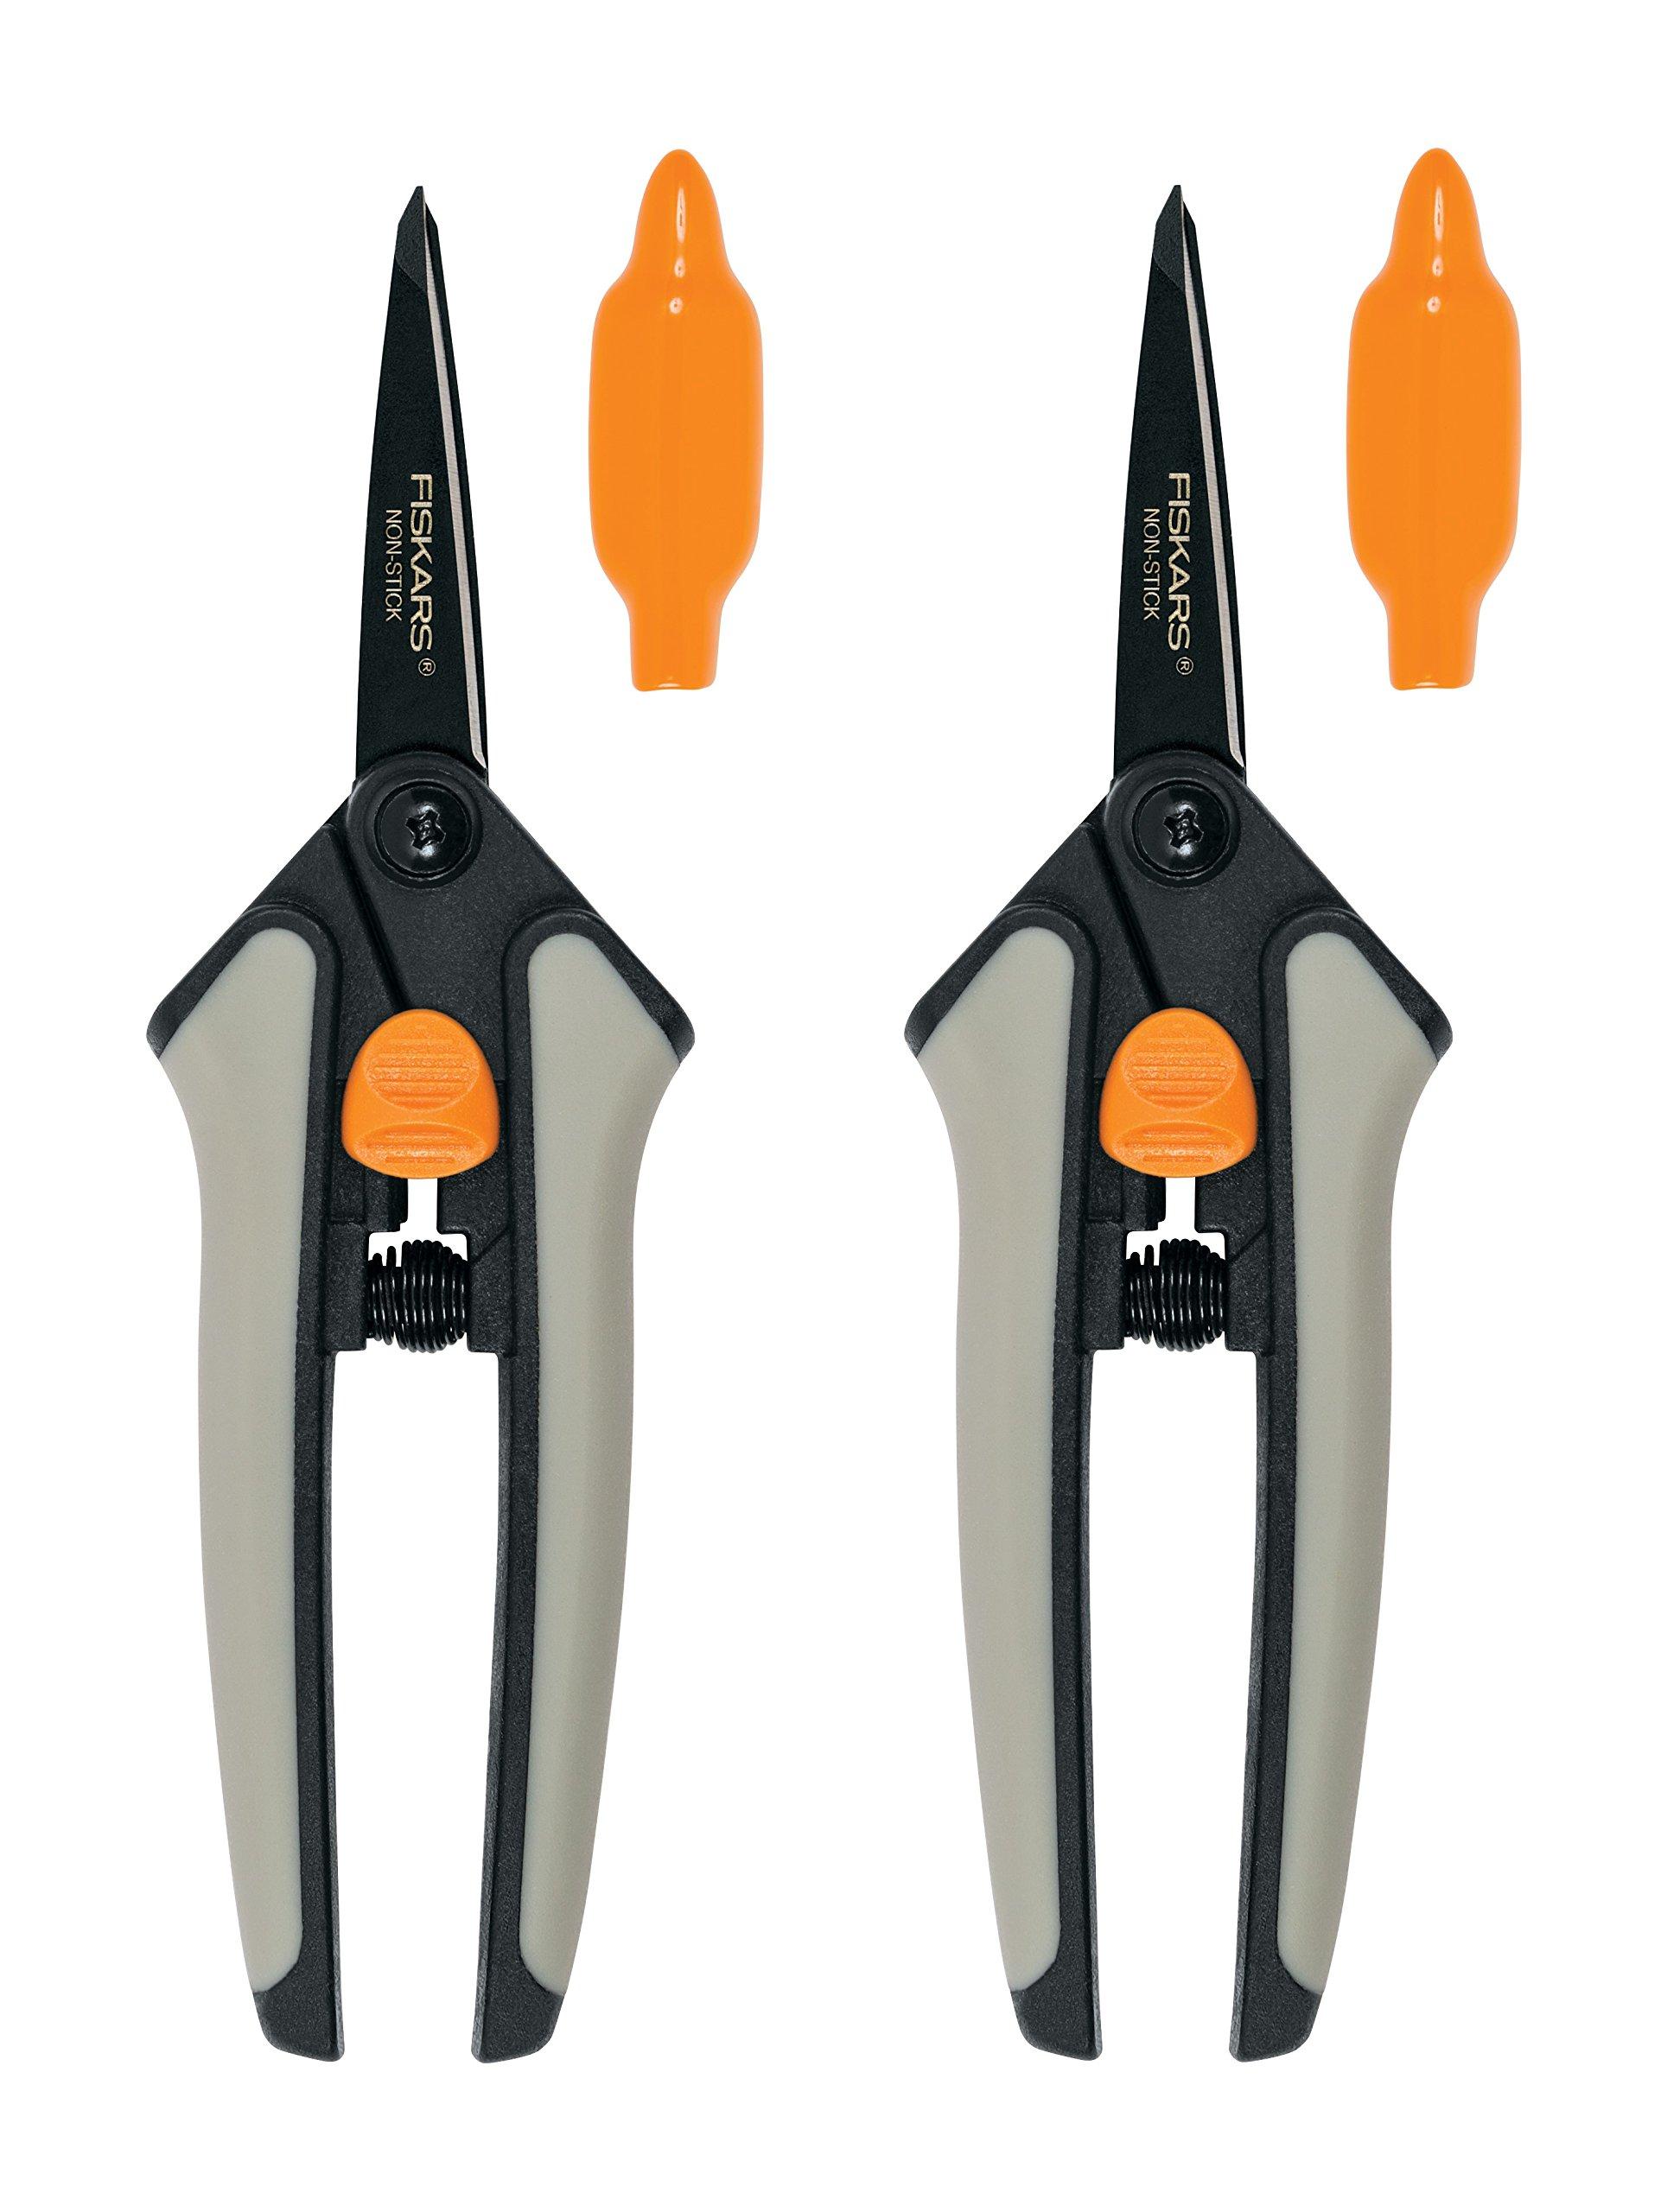 Fiskars Non-stick Softgrip Micro-Tip Pruning Snip, 2 Pack by Fiskars